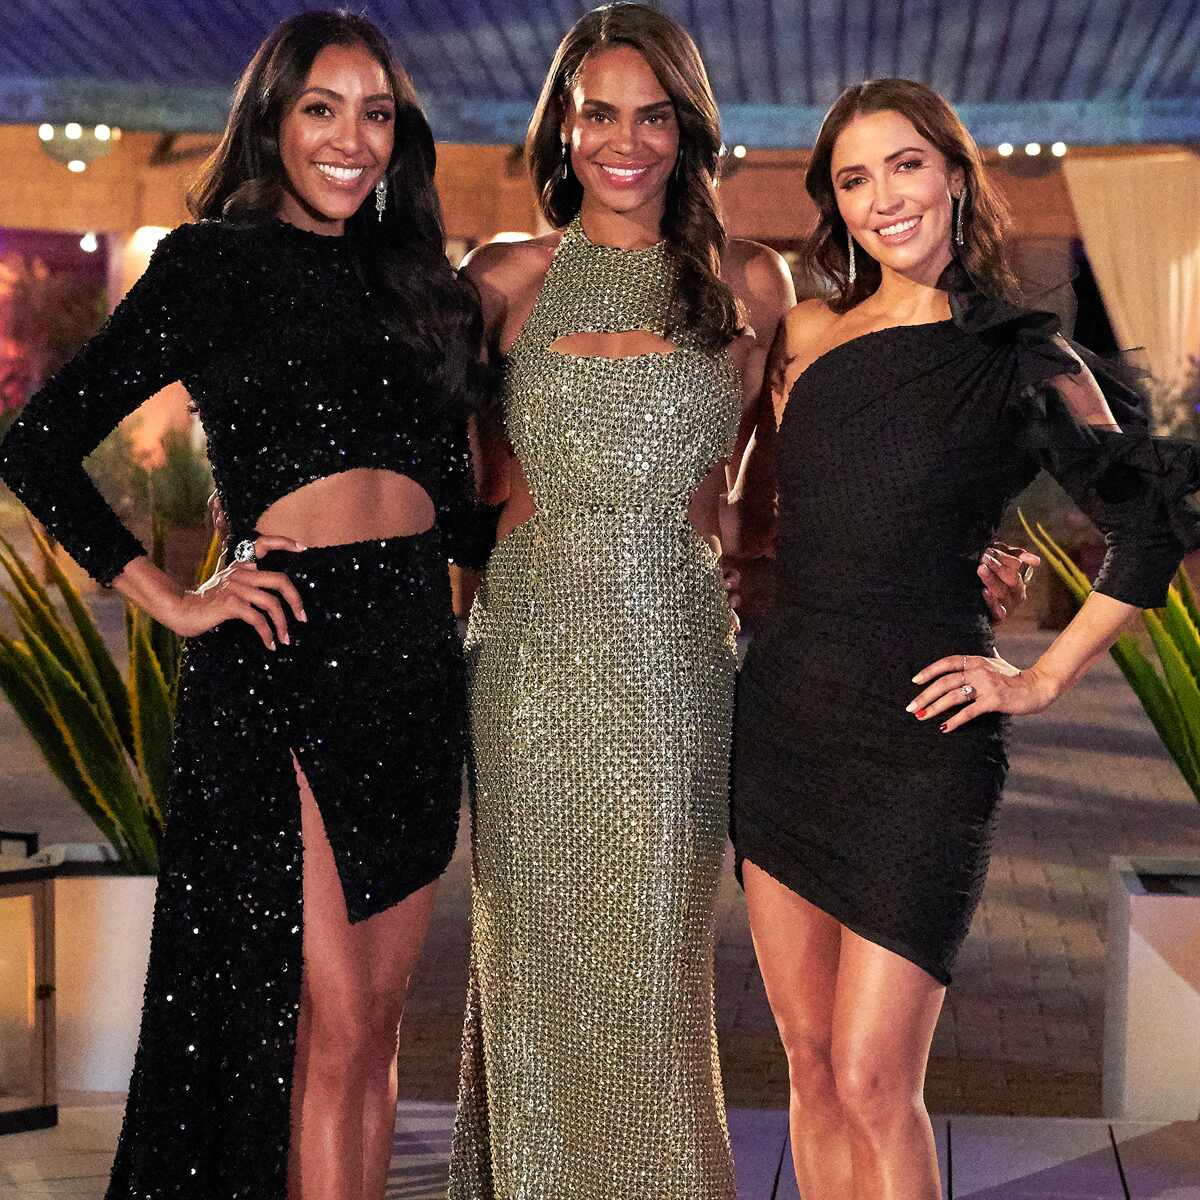 The Bachelorette Season 18 Fashion Episode 1